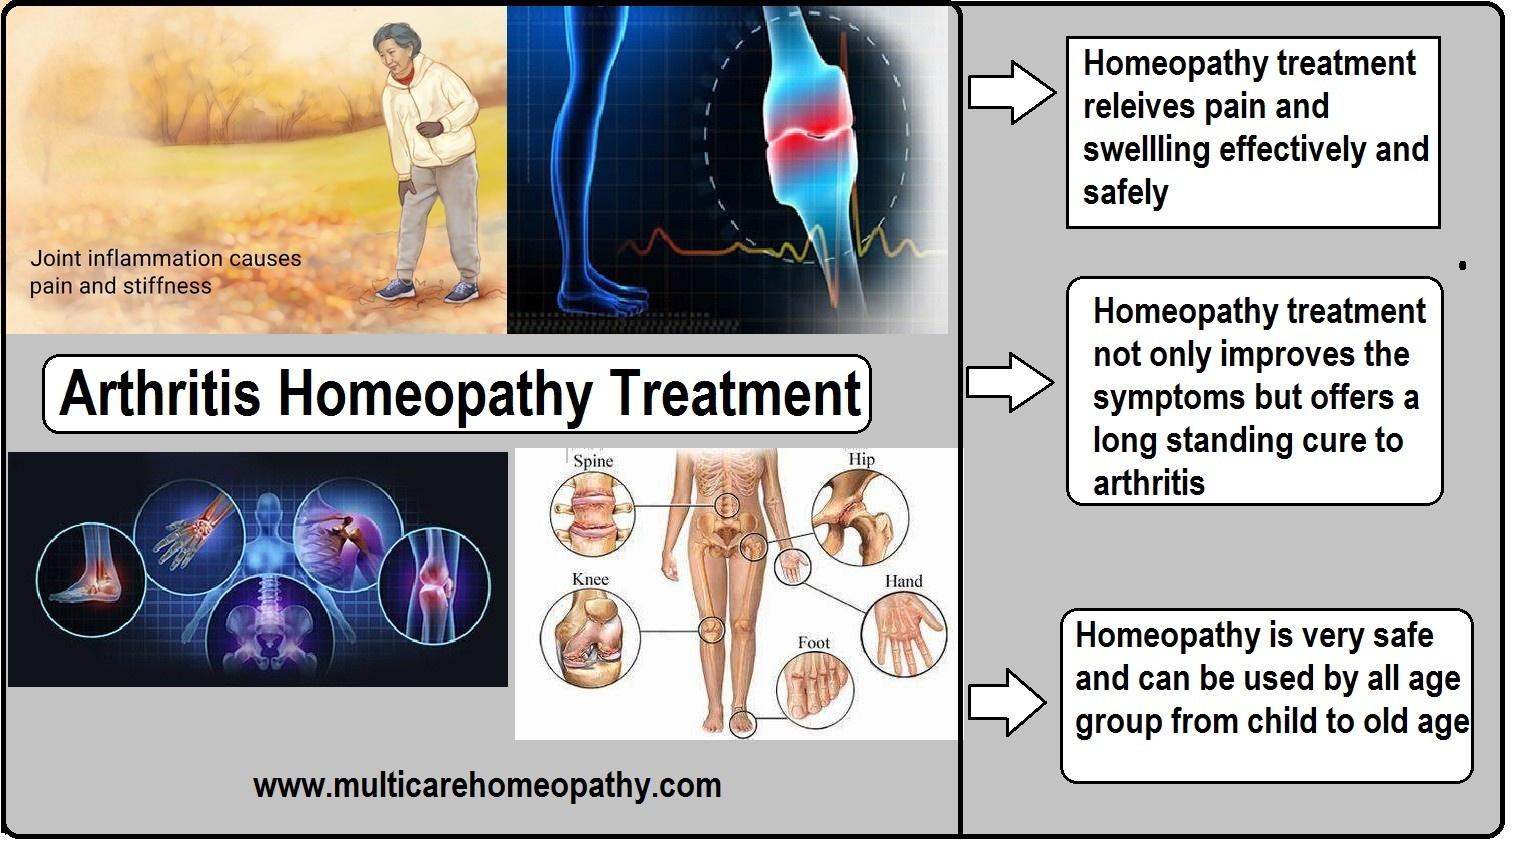 How is homeopathy helpful in the treatment of rheumatoid